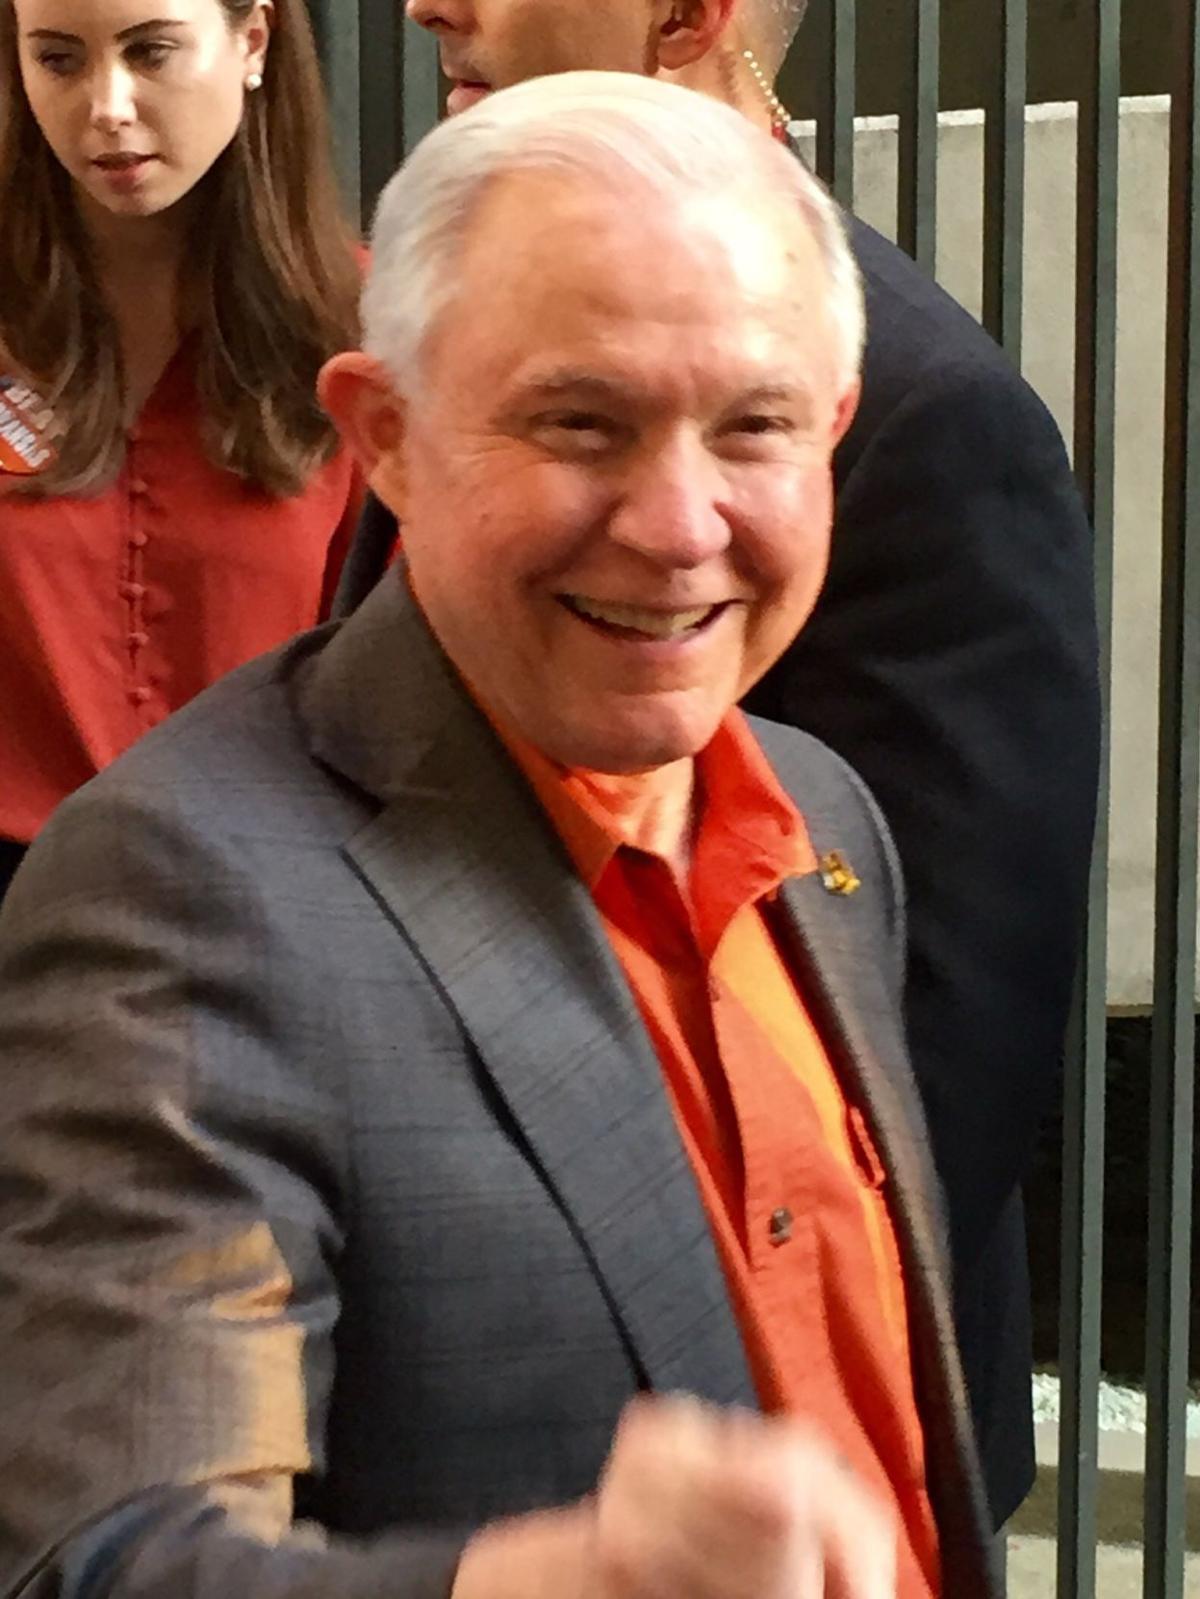 Jeff Sessions at Auburn University